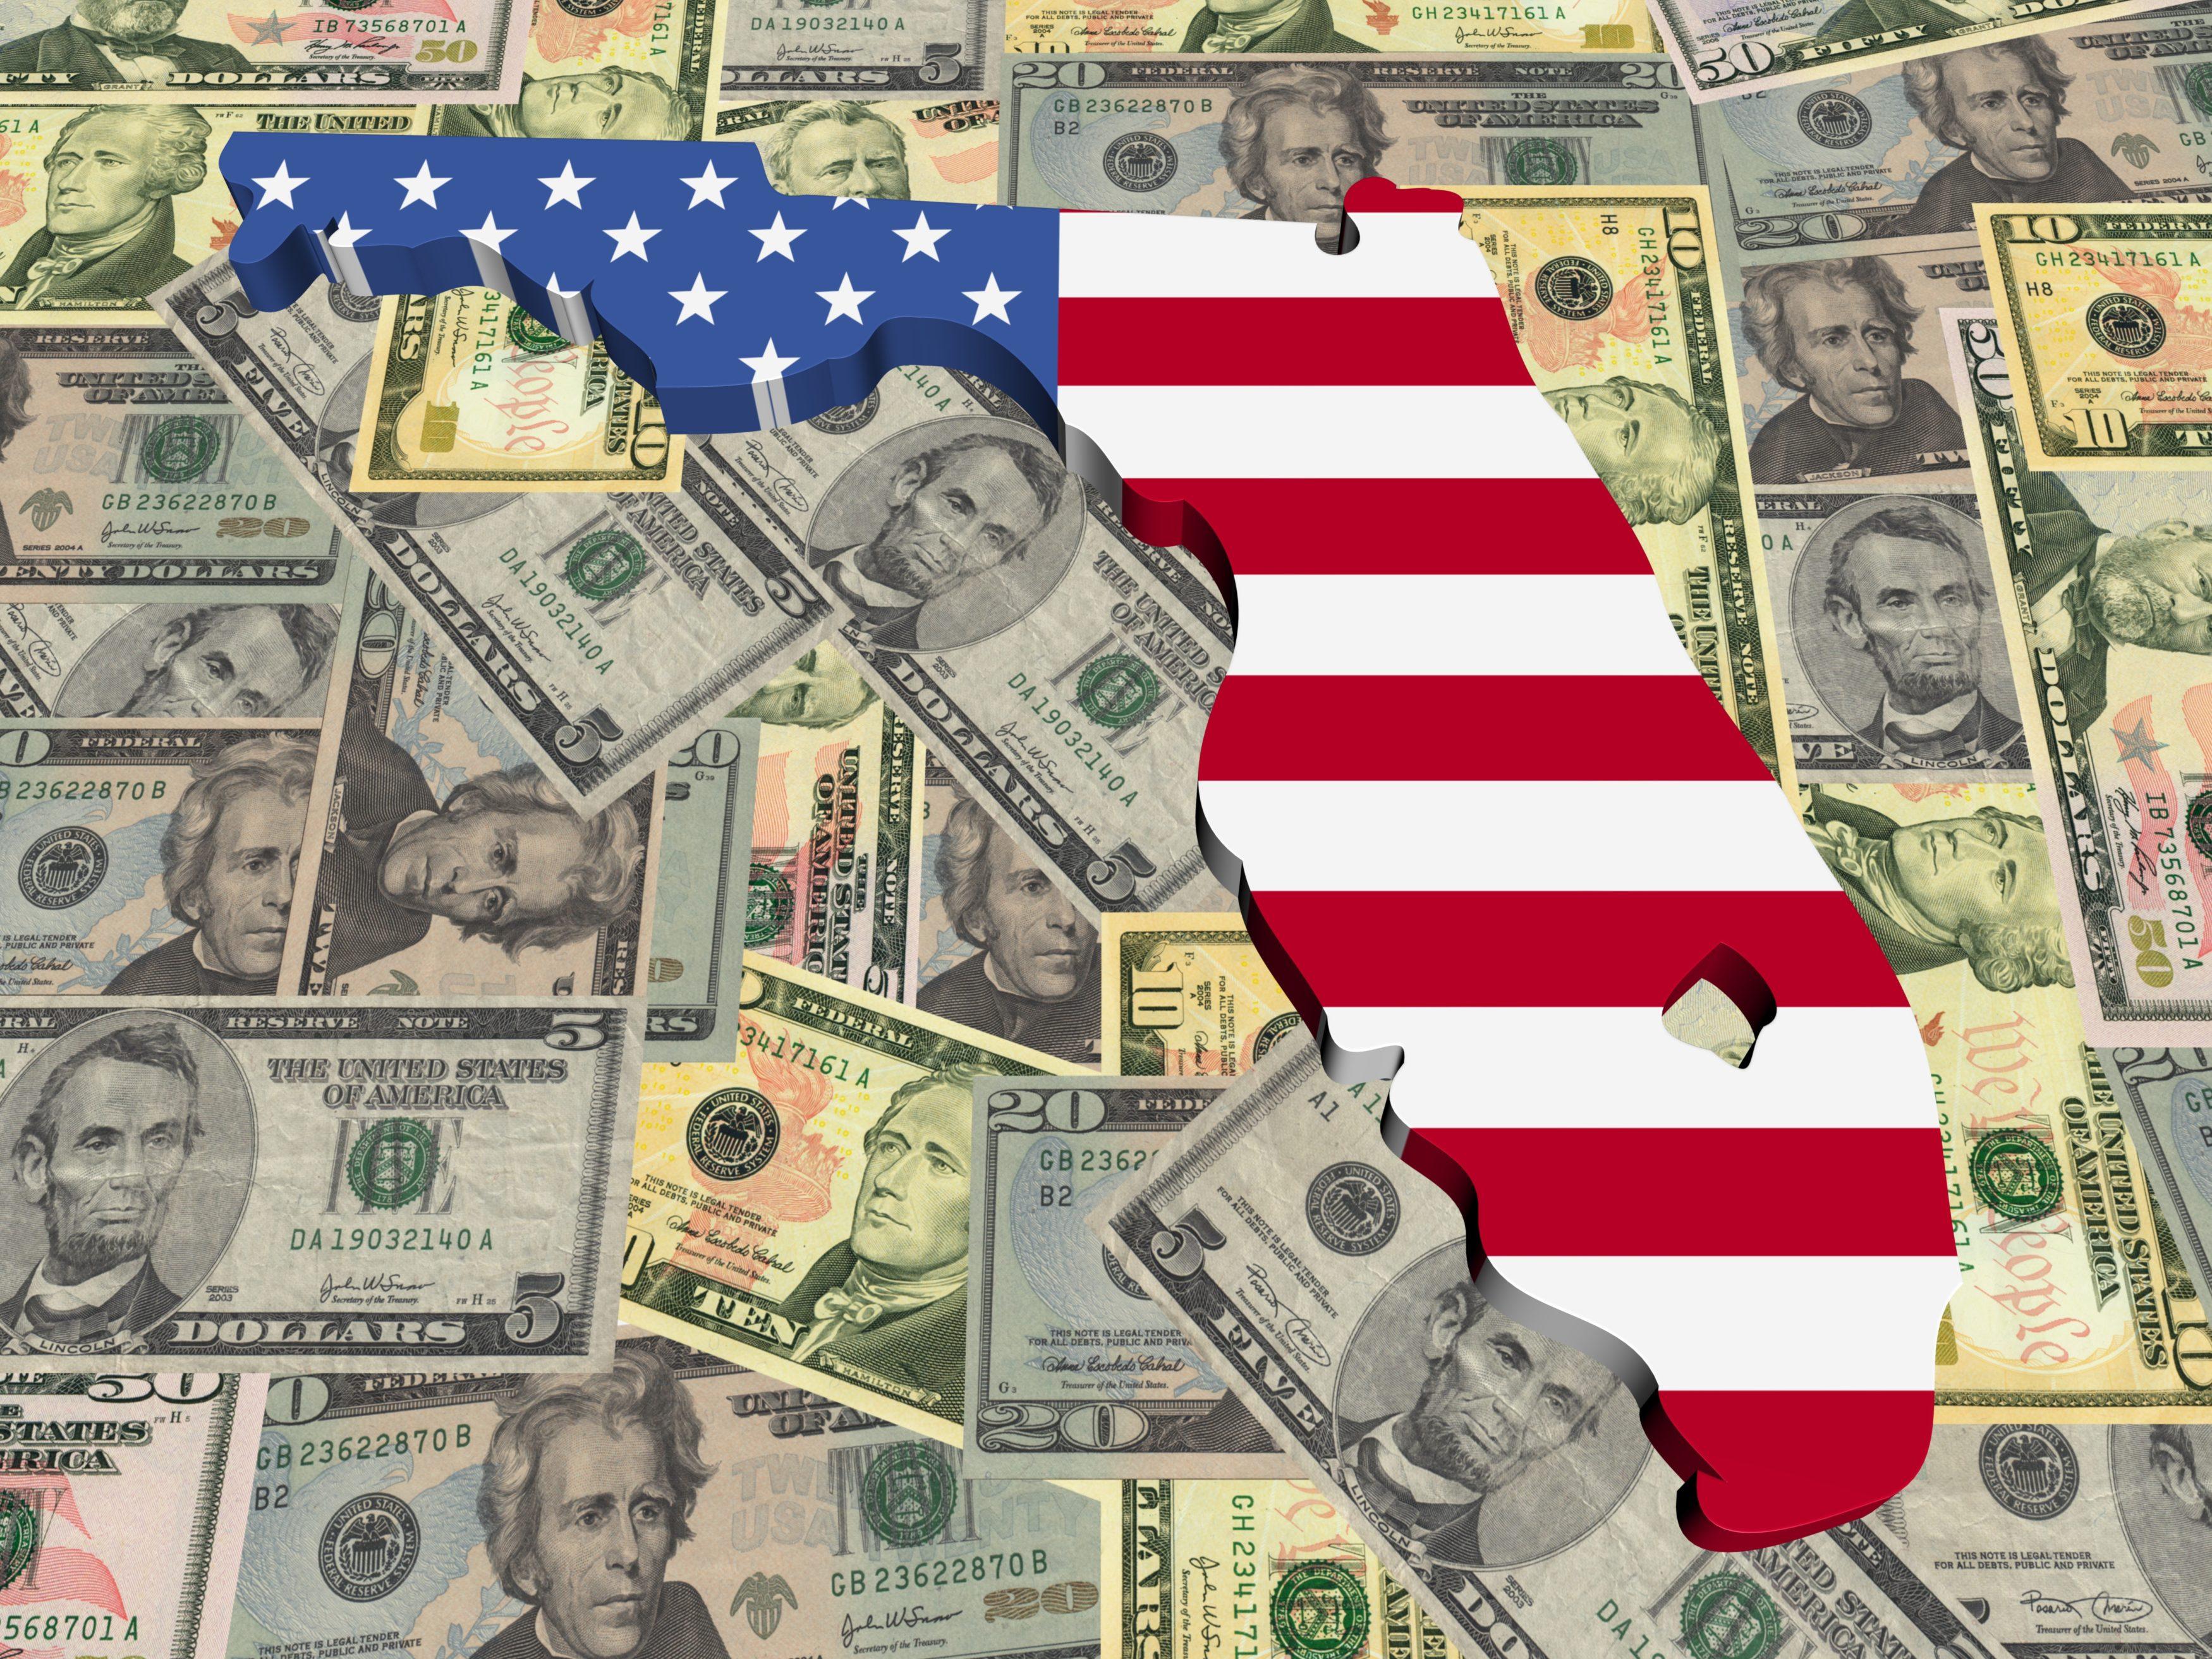 florida-usa-money-flag-3500x2625.jpeg